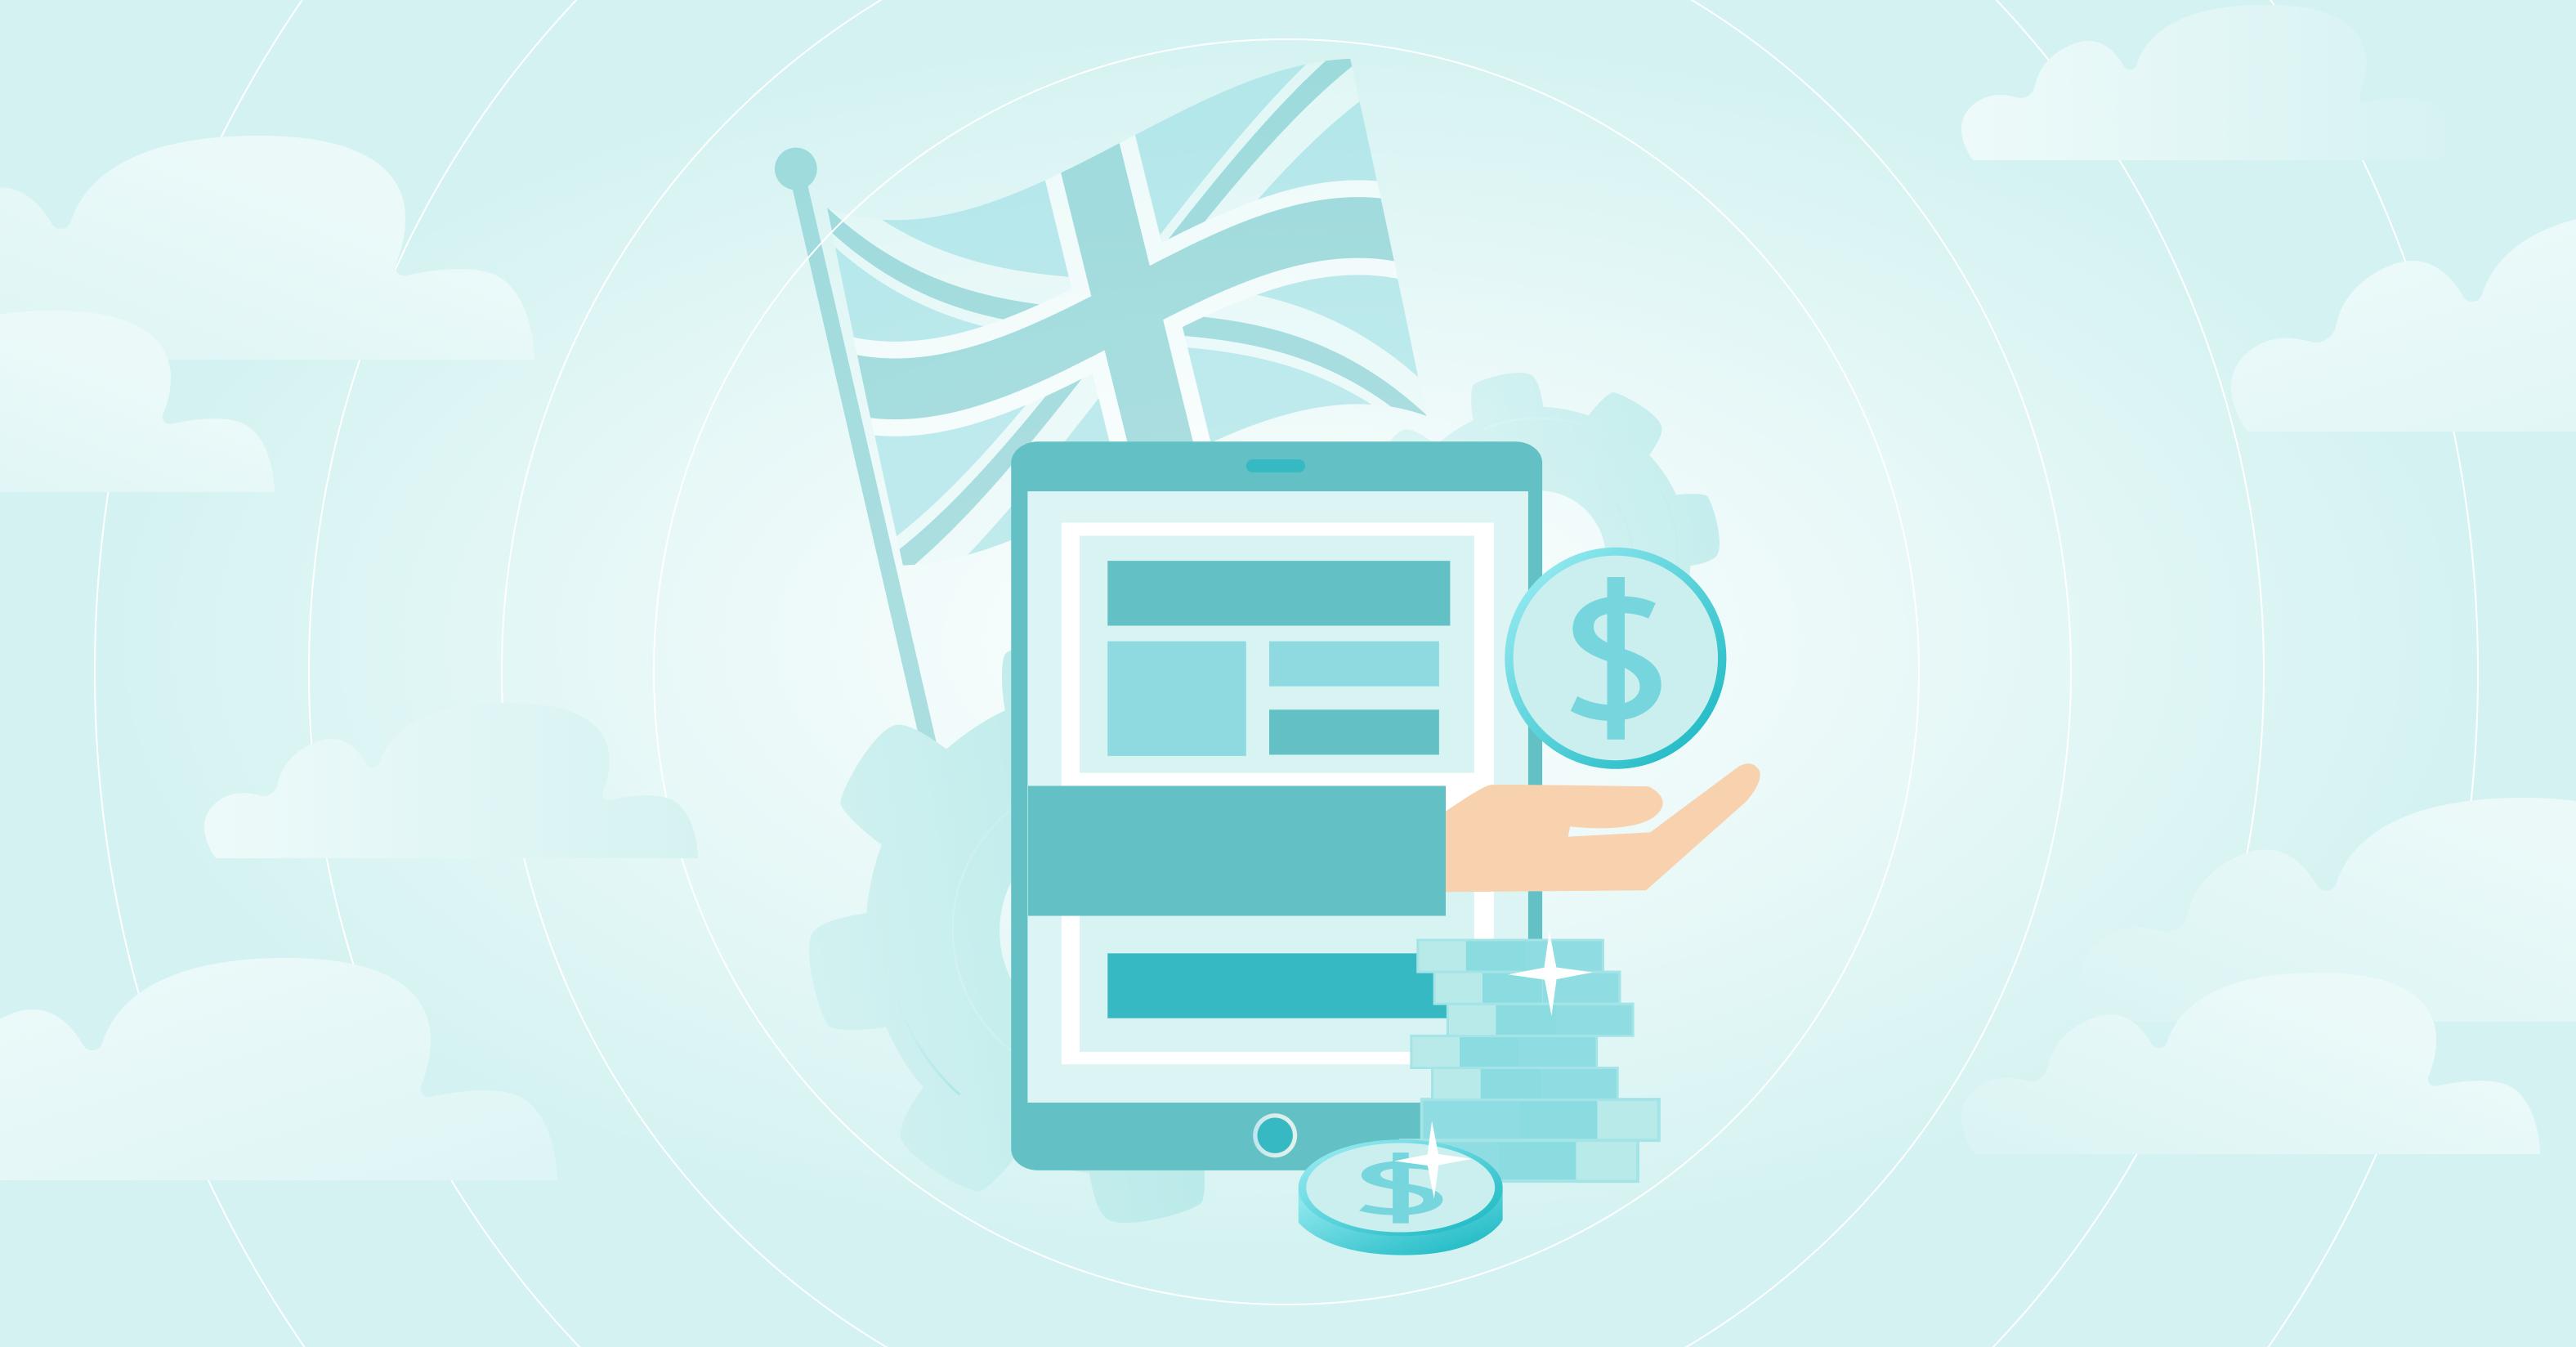 Top 10 UK Fintech Lending Companies to Follow in 2021